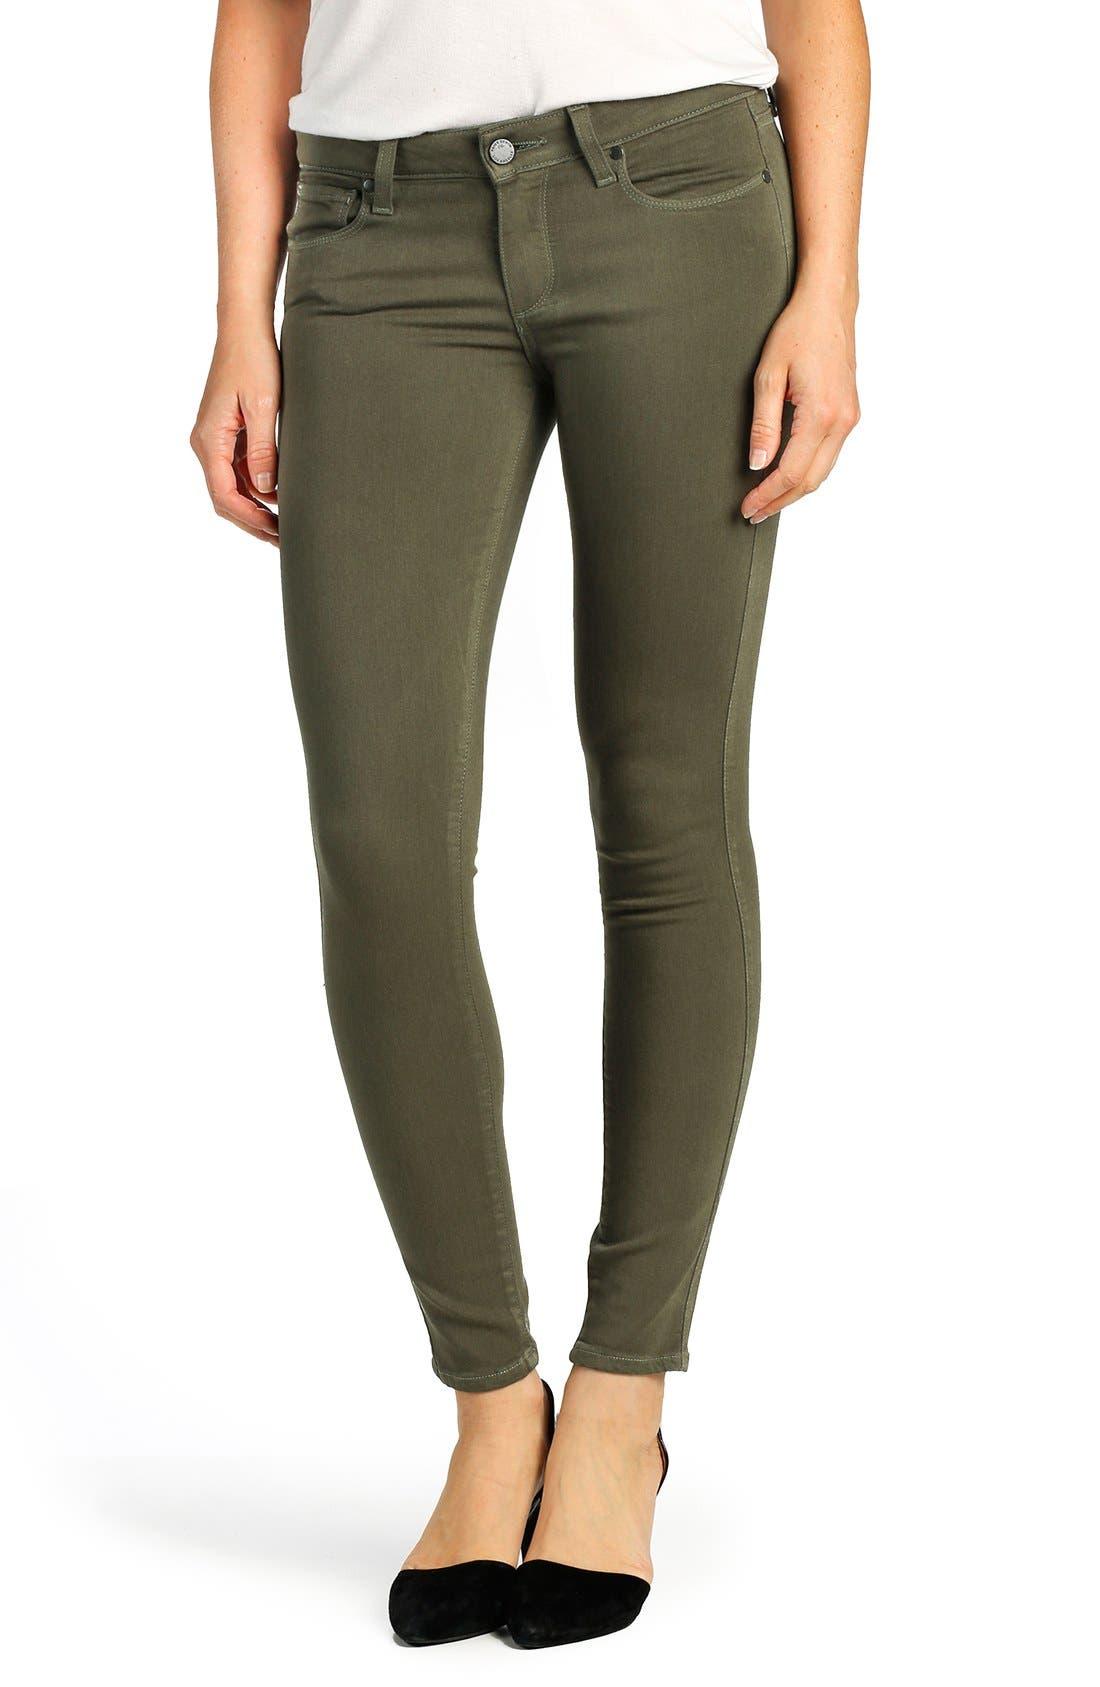 Main Image - PAIGE 'Transcend - Verdugo' Ankle Ultra Skinny Jeans (Desert Olive)